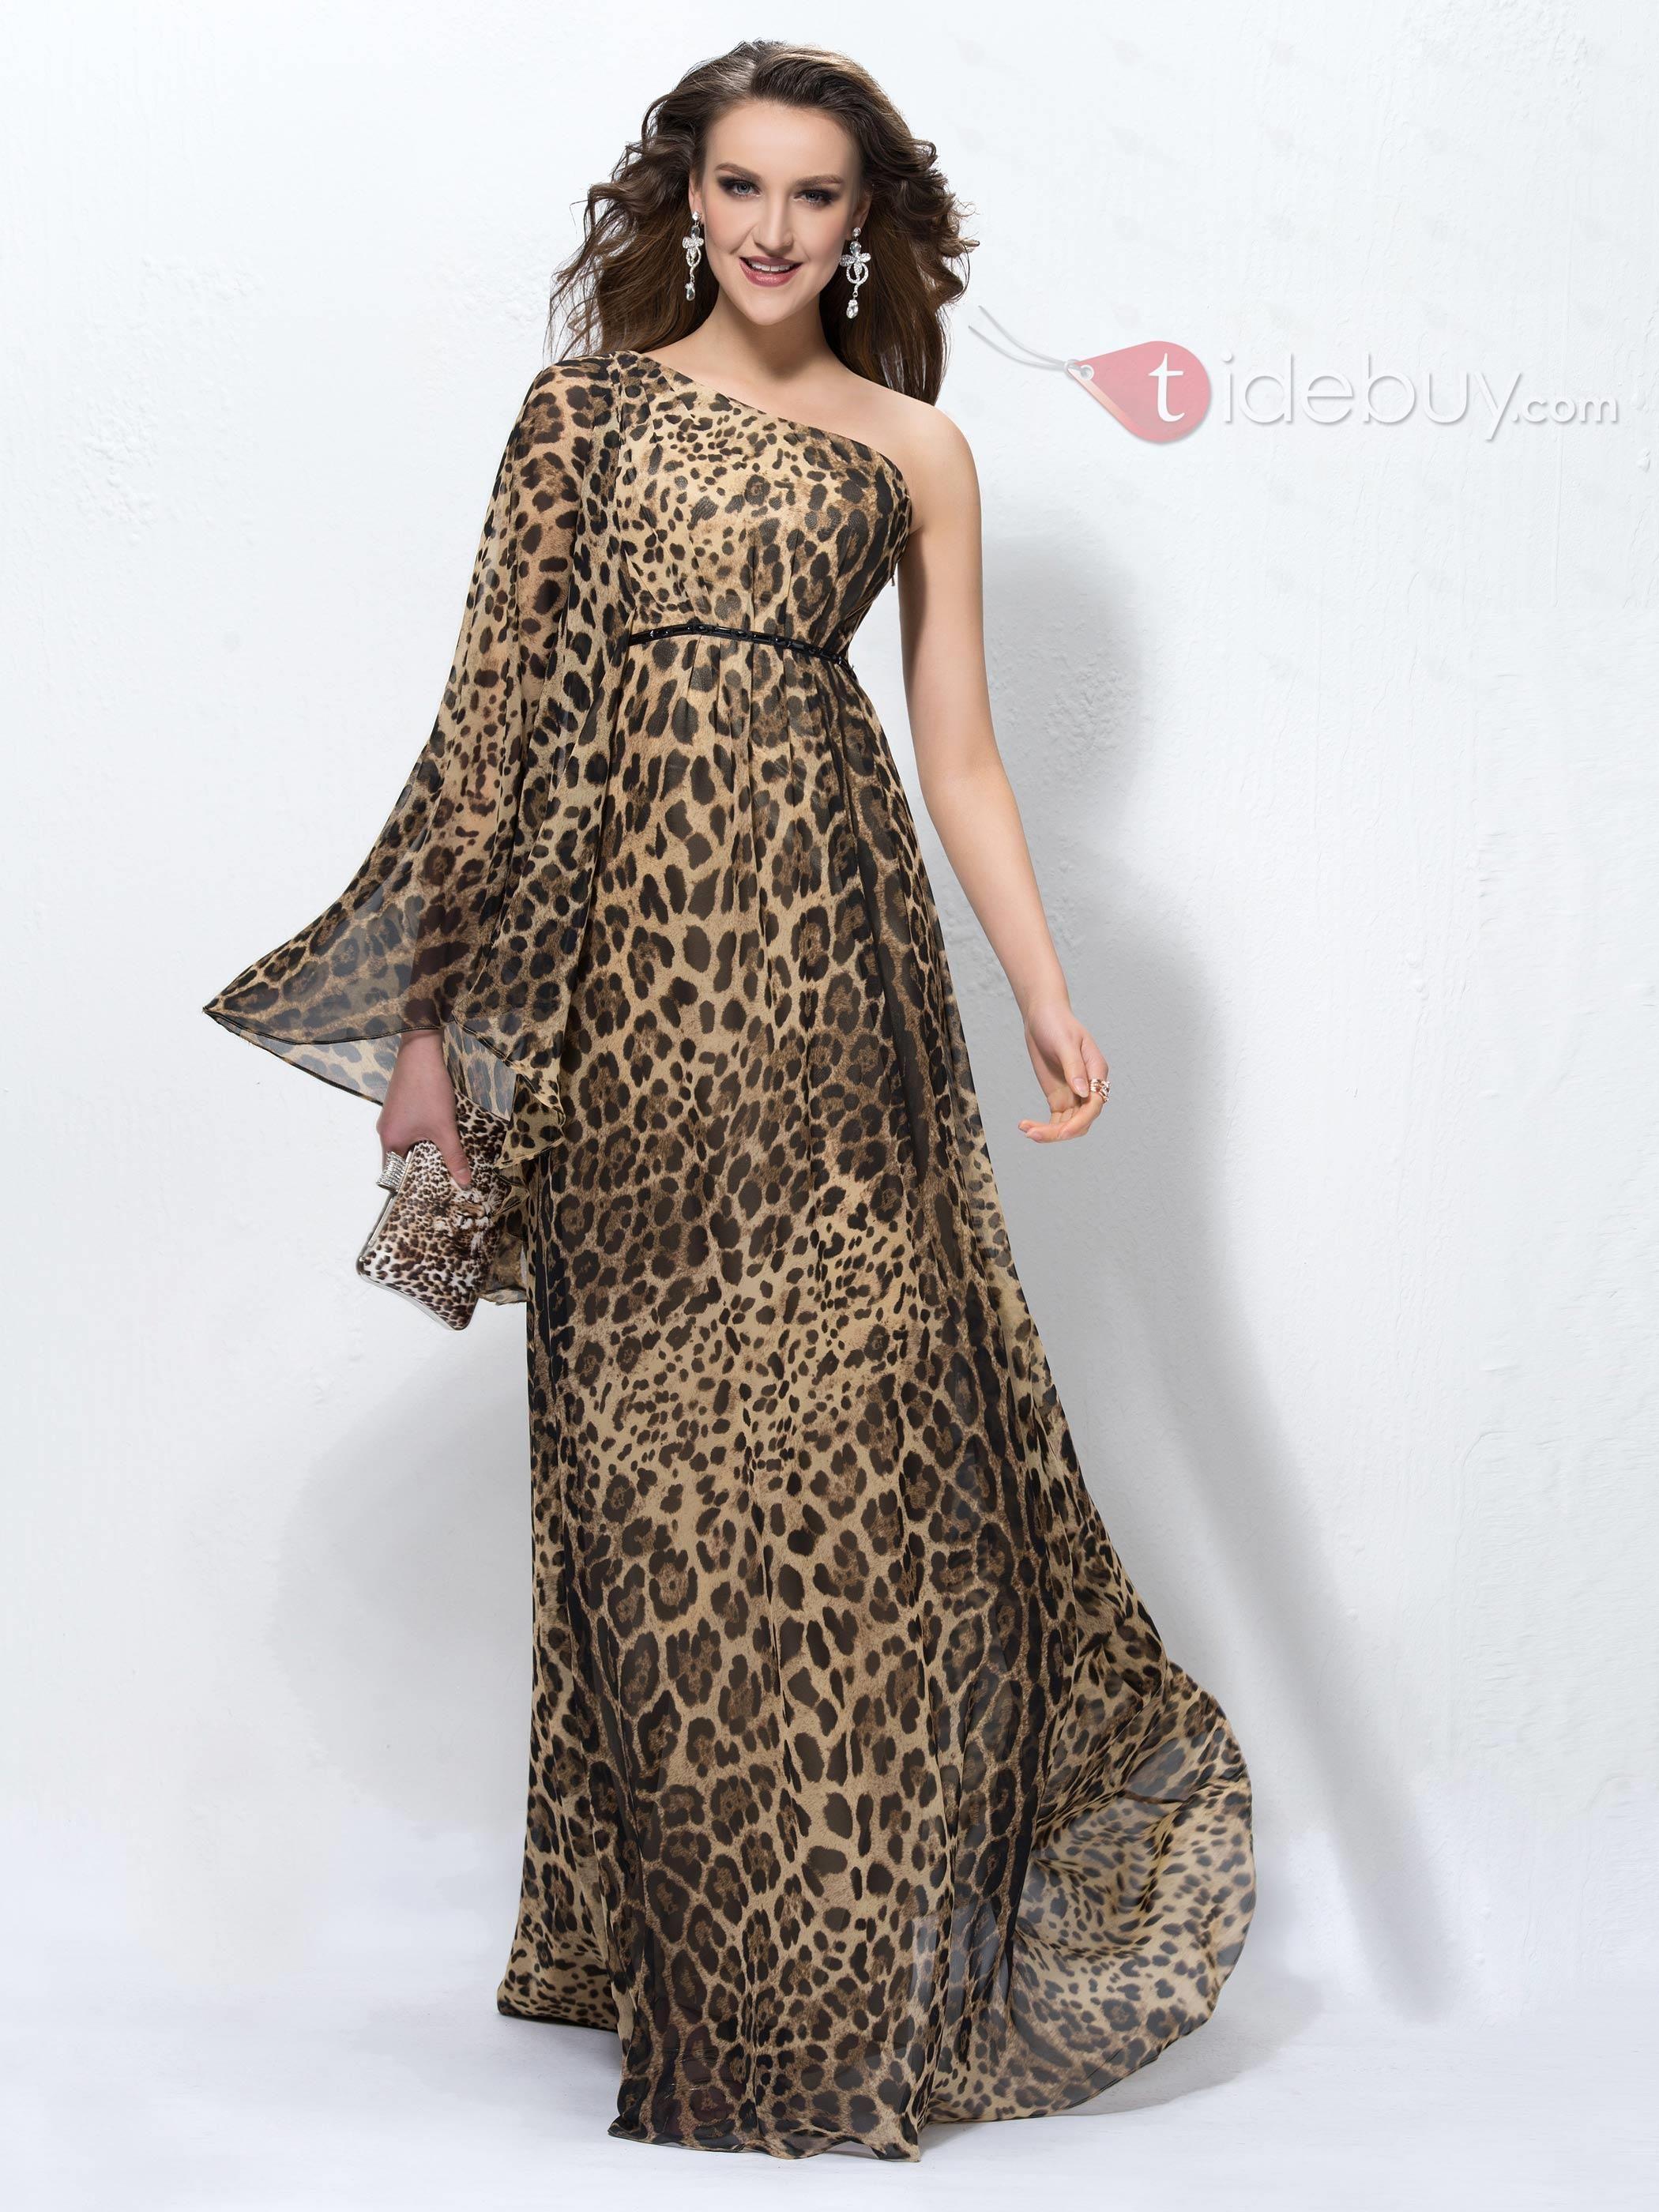 One Shoulder Long Sleeve Leopard Print Evening Dress Evening Dresses Animal Print Dresses Evening Dress Floor Length [ 2800 x 2100 Pixel ]